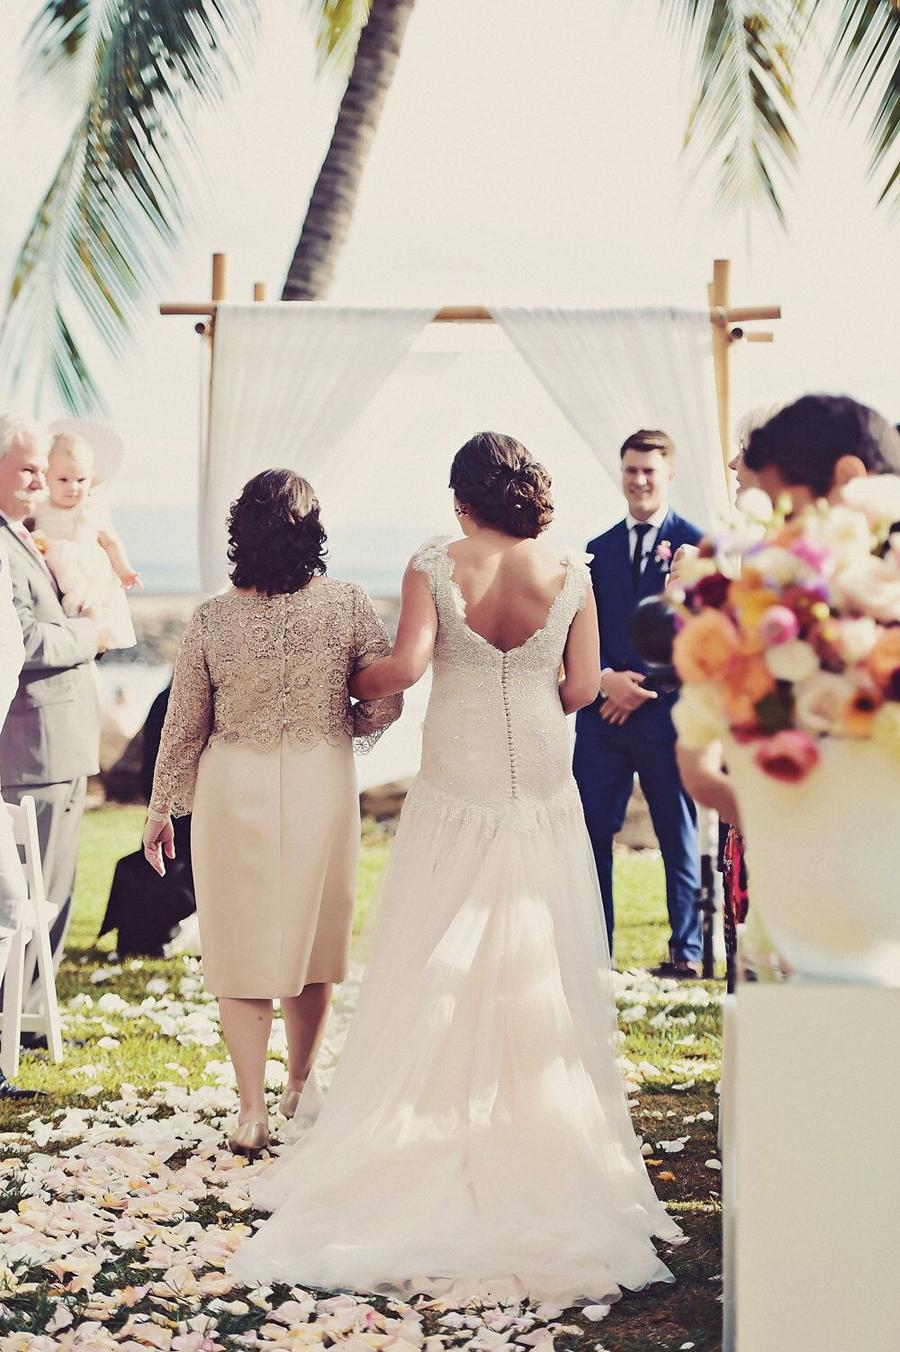 Ceremony, Ceremony Space, Ceremony Design, Wedding, Wedding Day, Bride, Groom